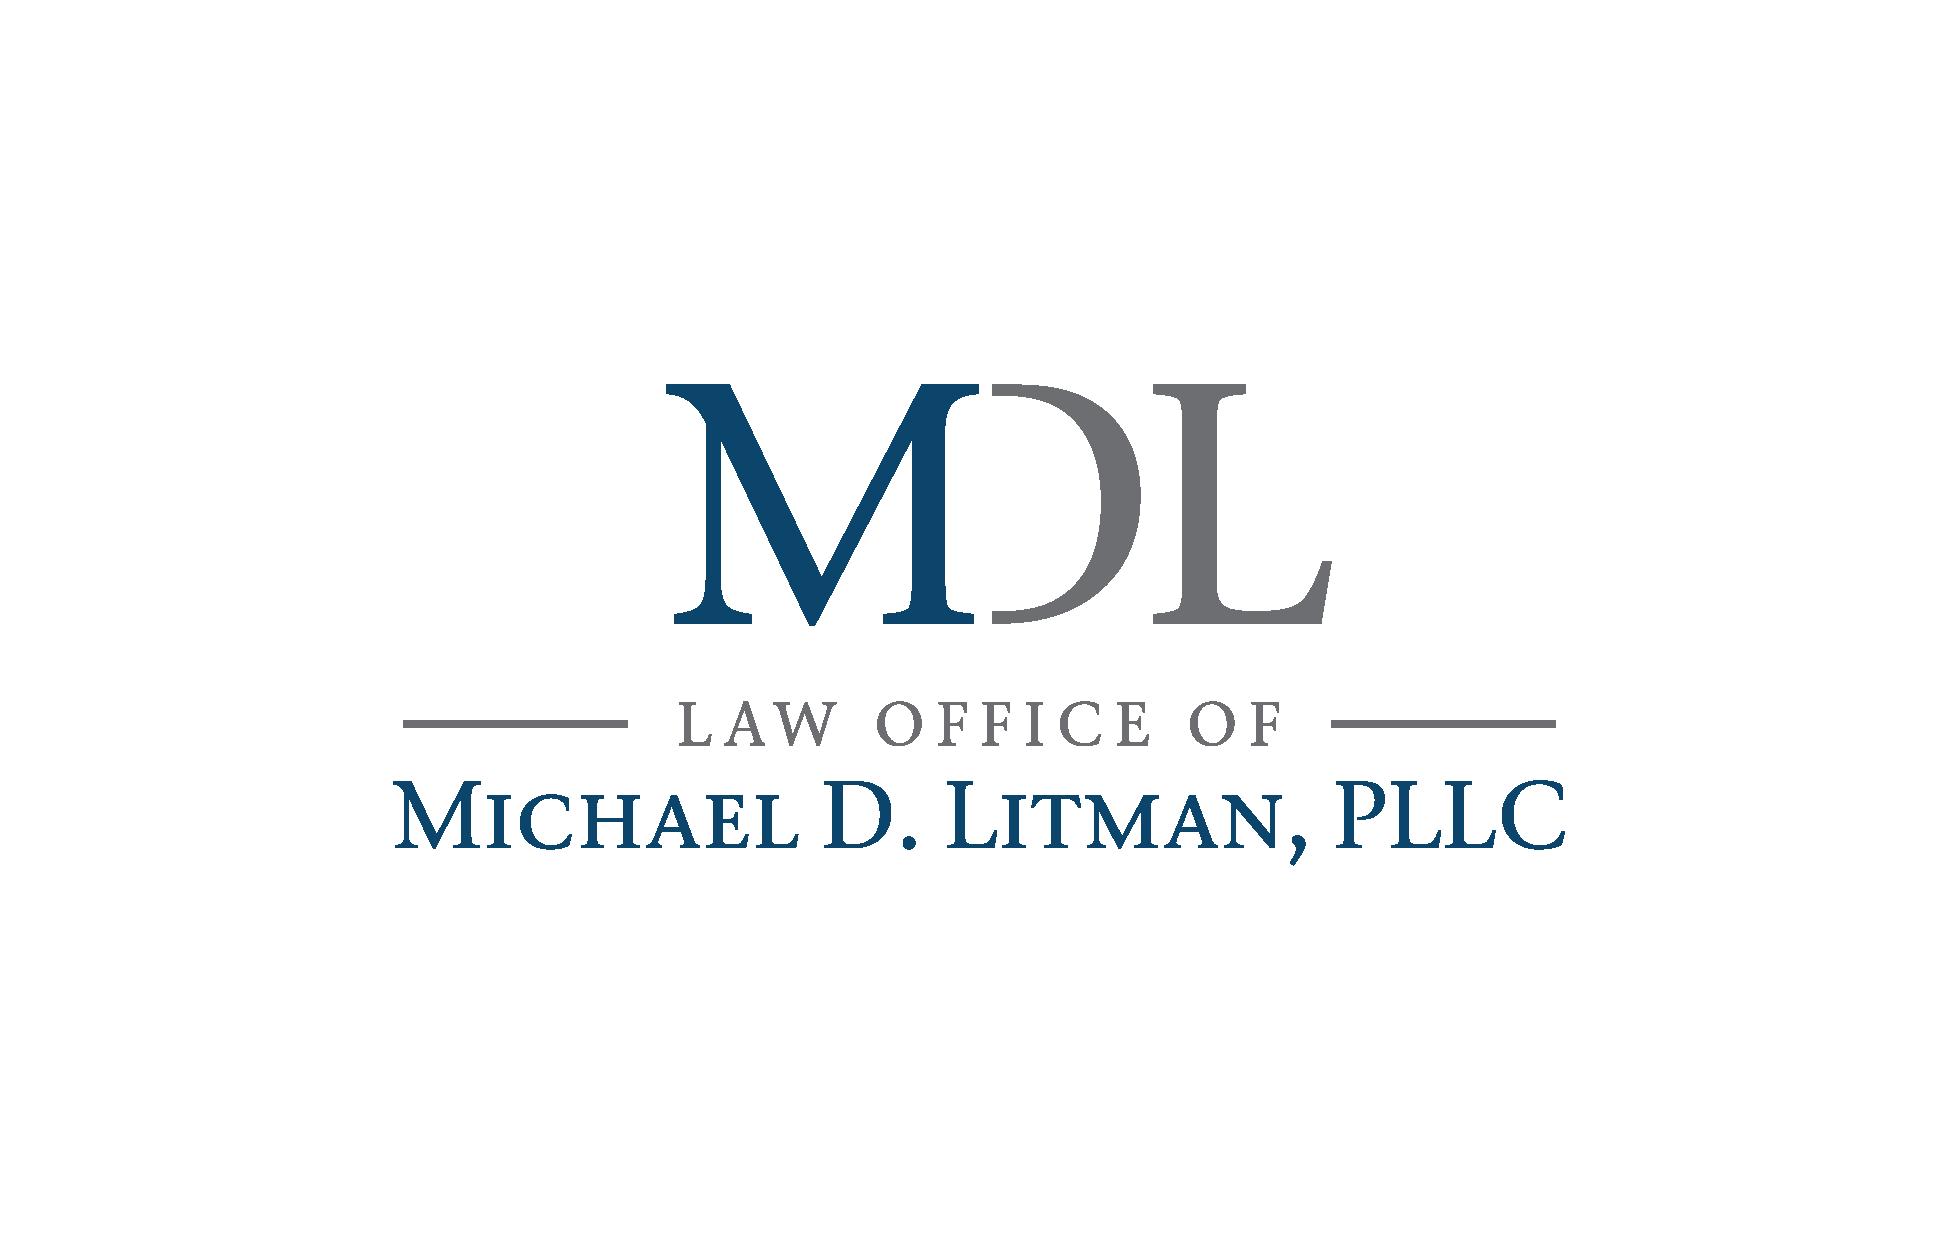 Law Office of Michael D. Litman, PLLC